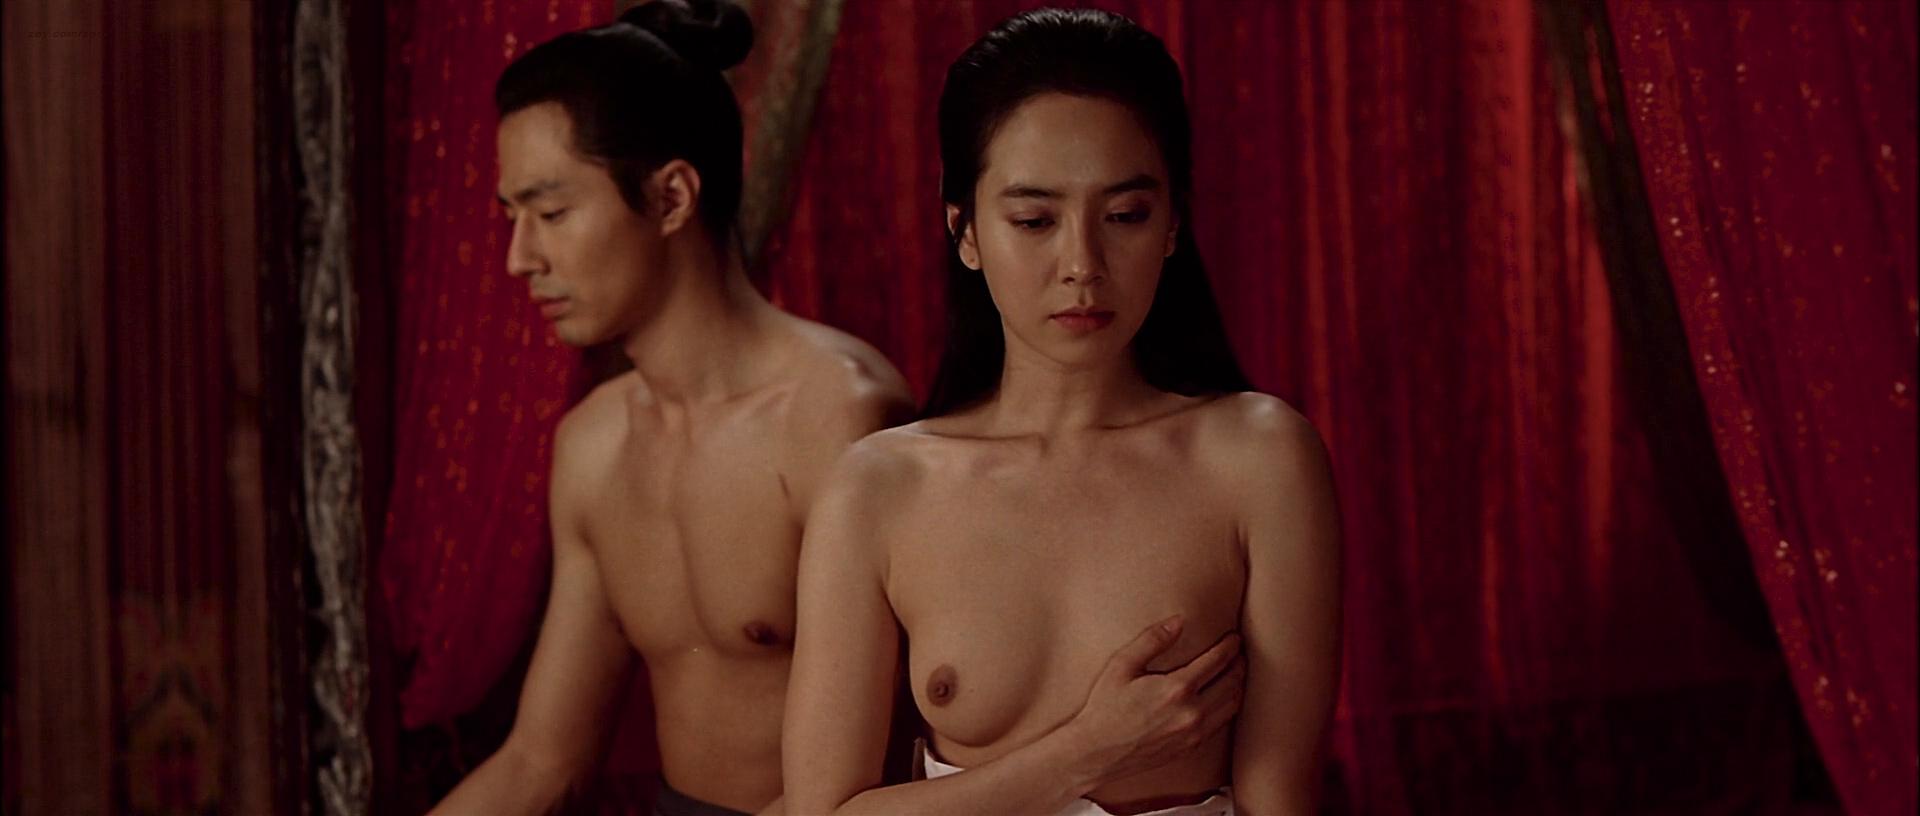 Ji-hyo Song nude topless butt and lot of hot sex - A Frozen Flower (KR-2008) HD 1080p BluRay (13)